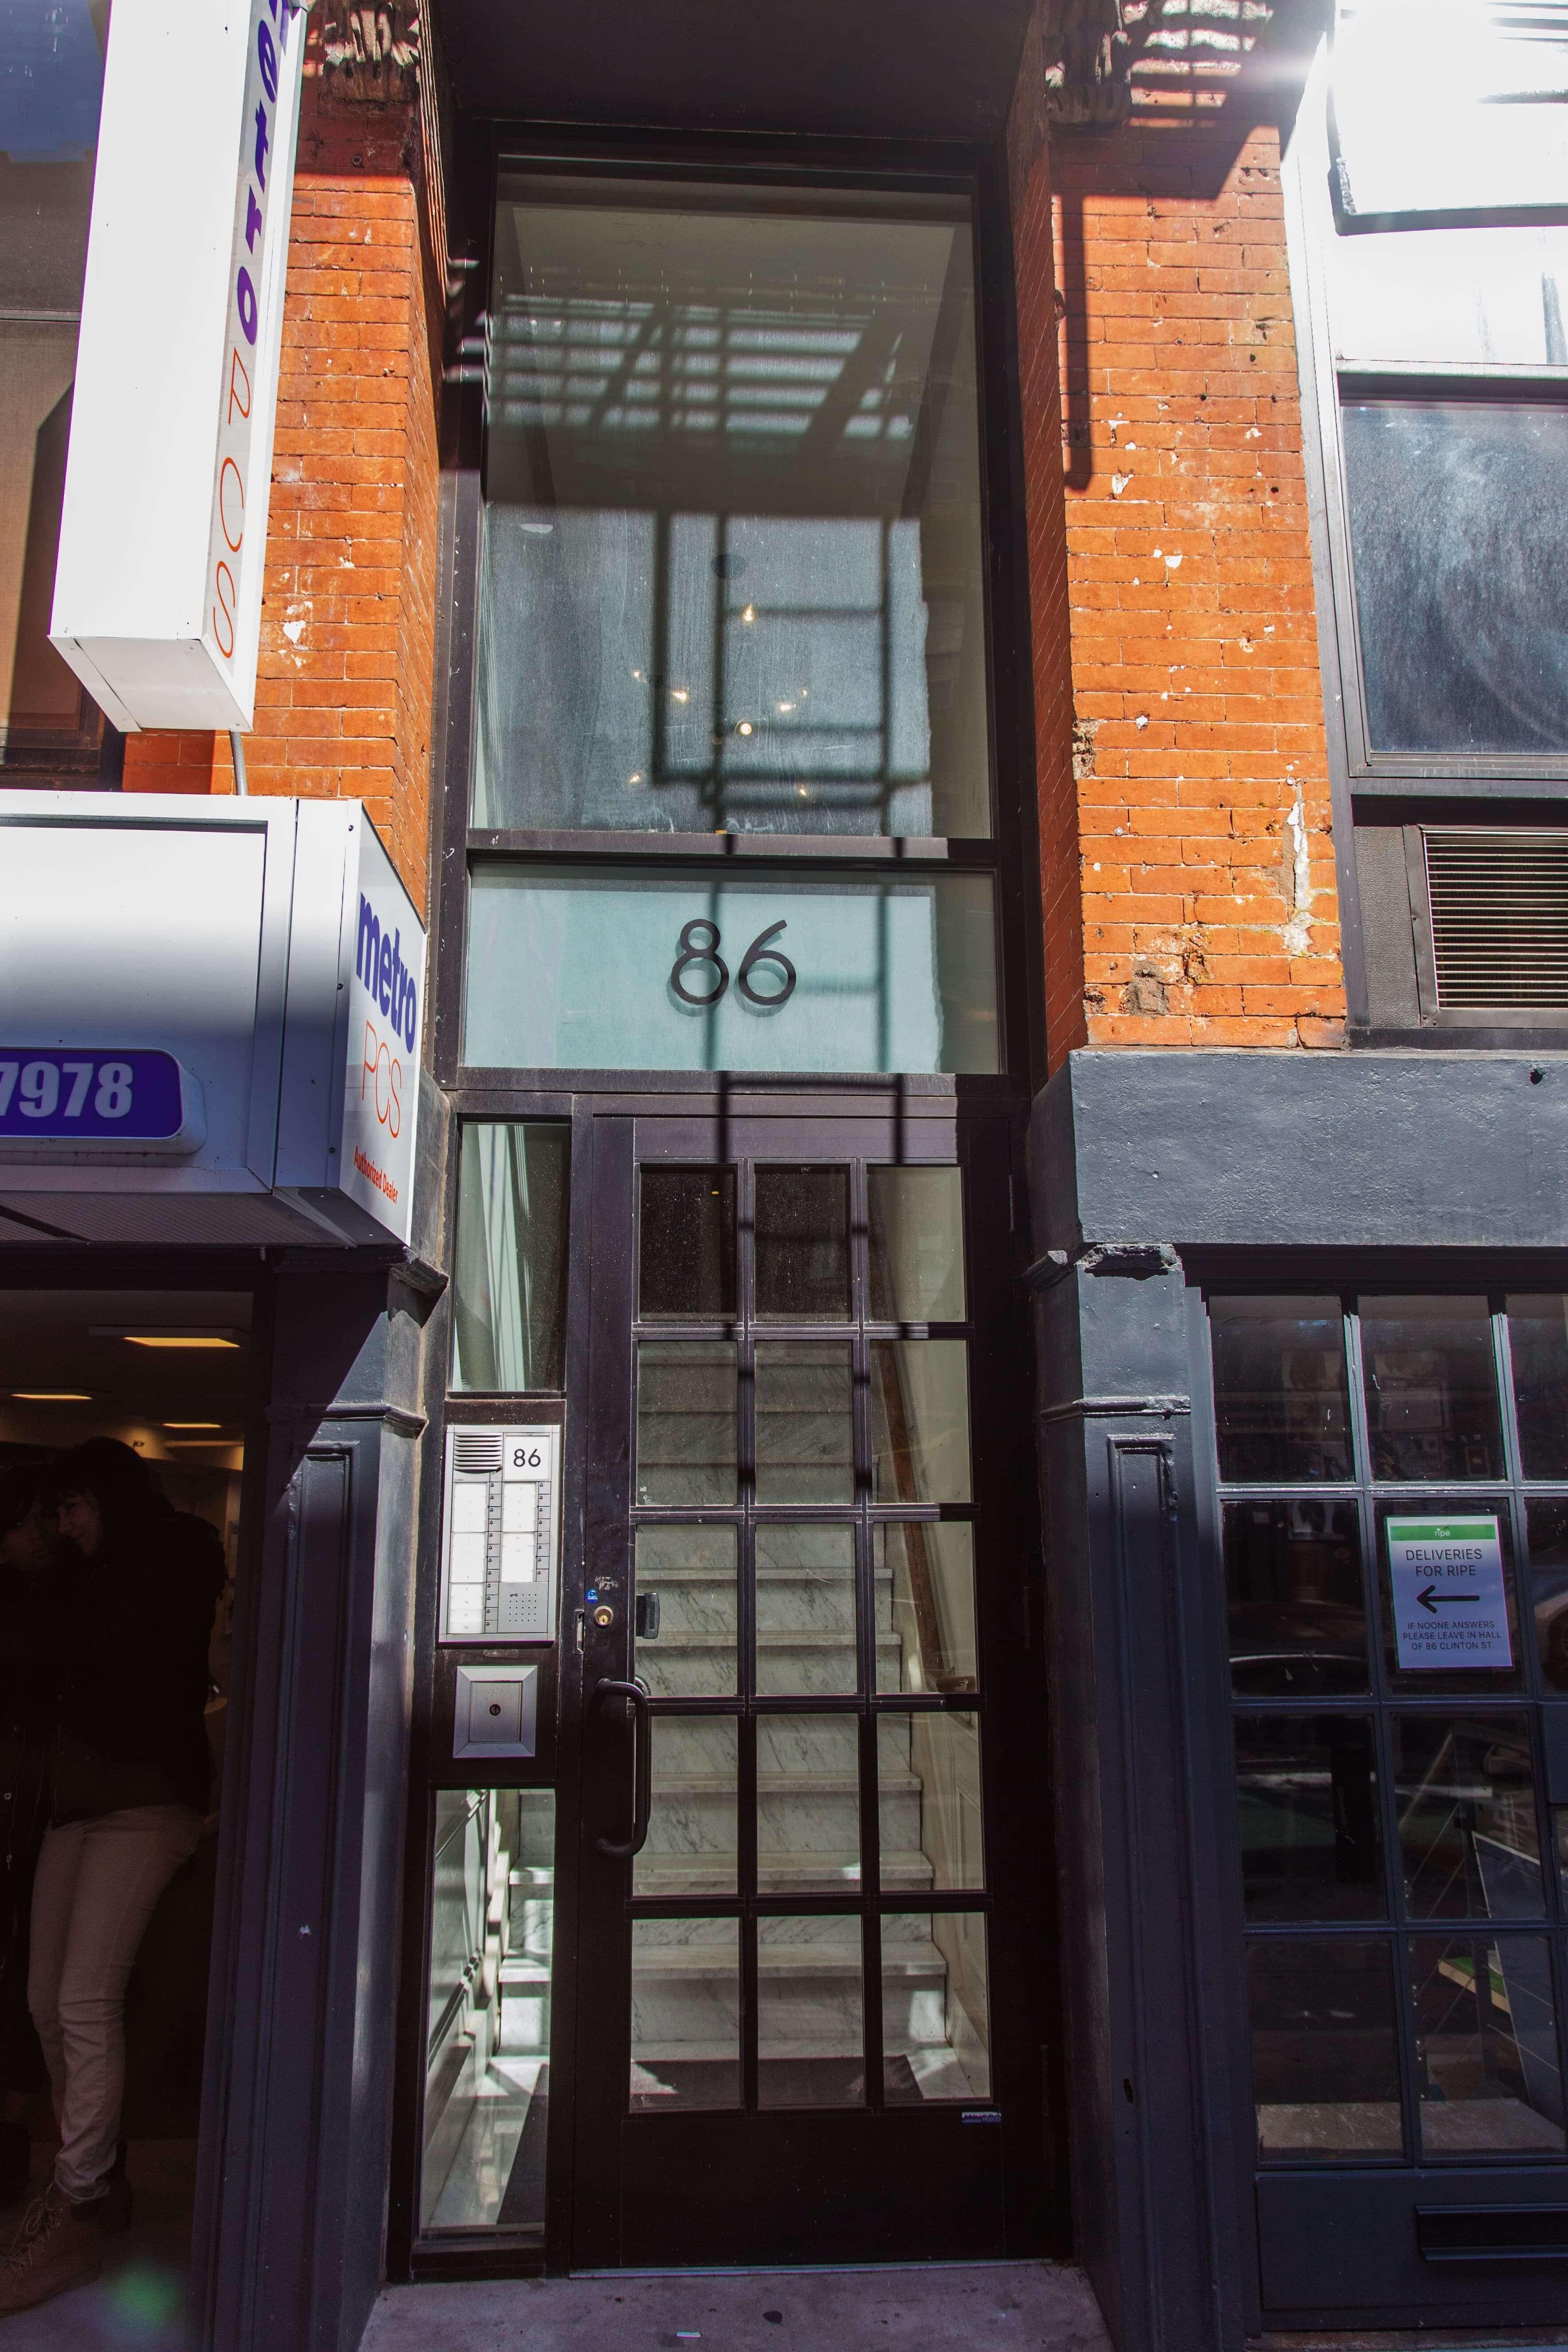 86-Clinton-Street.jpg